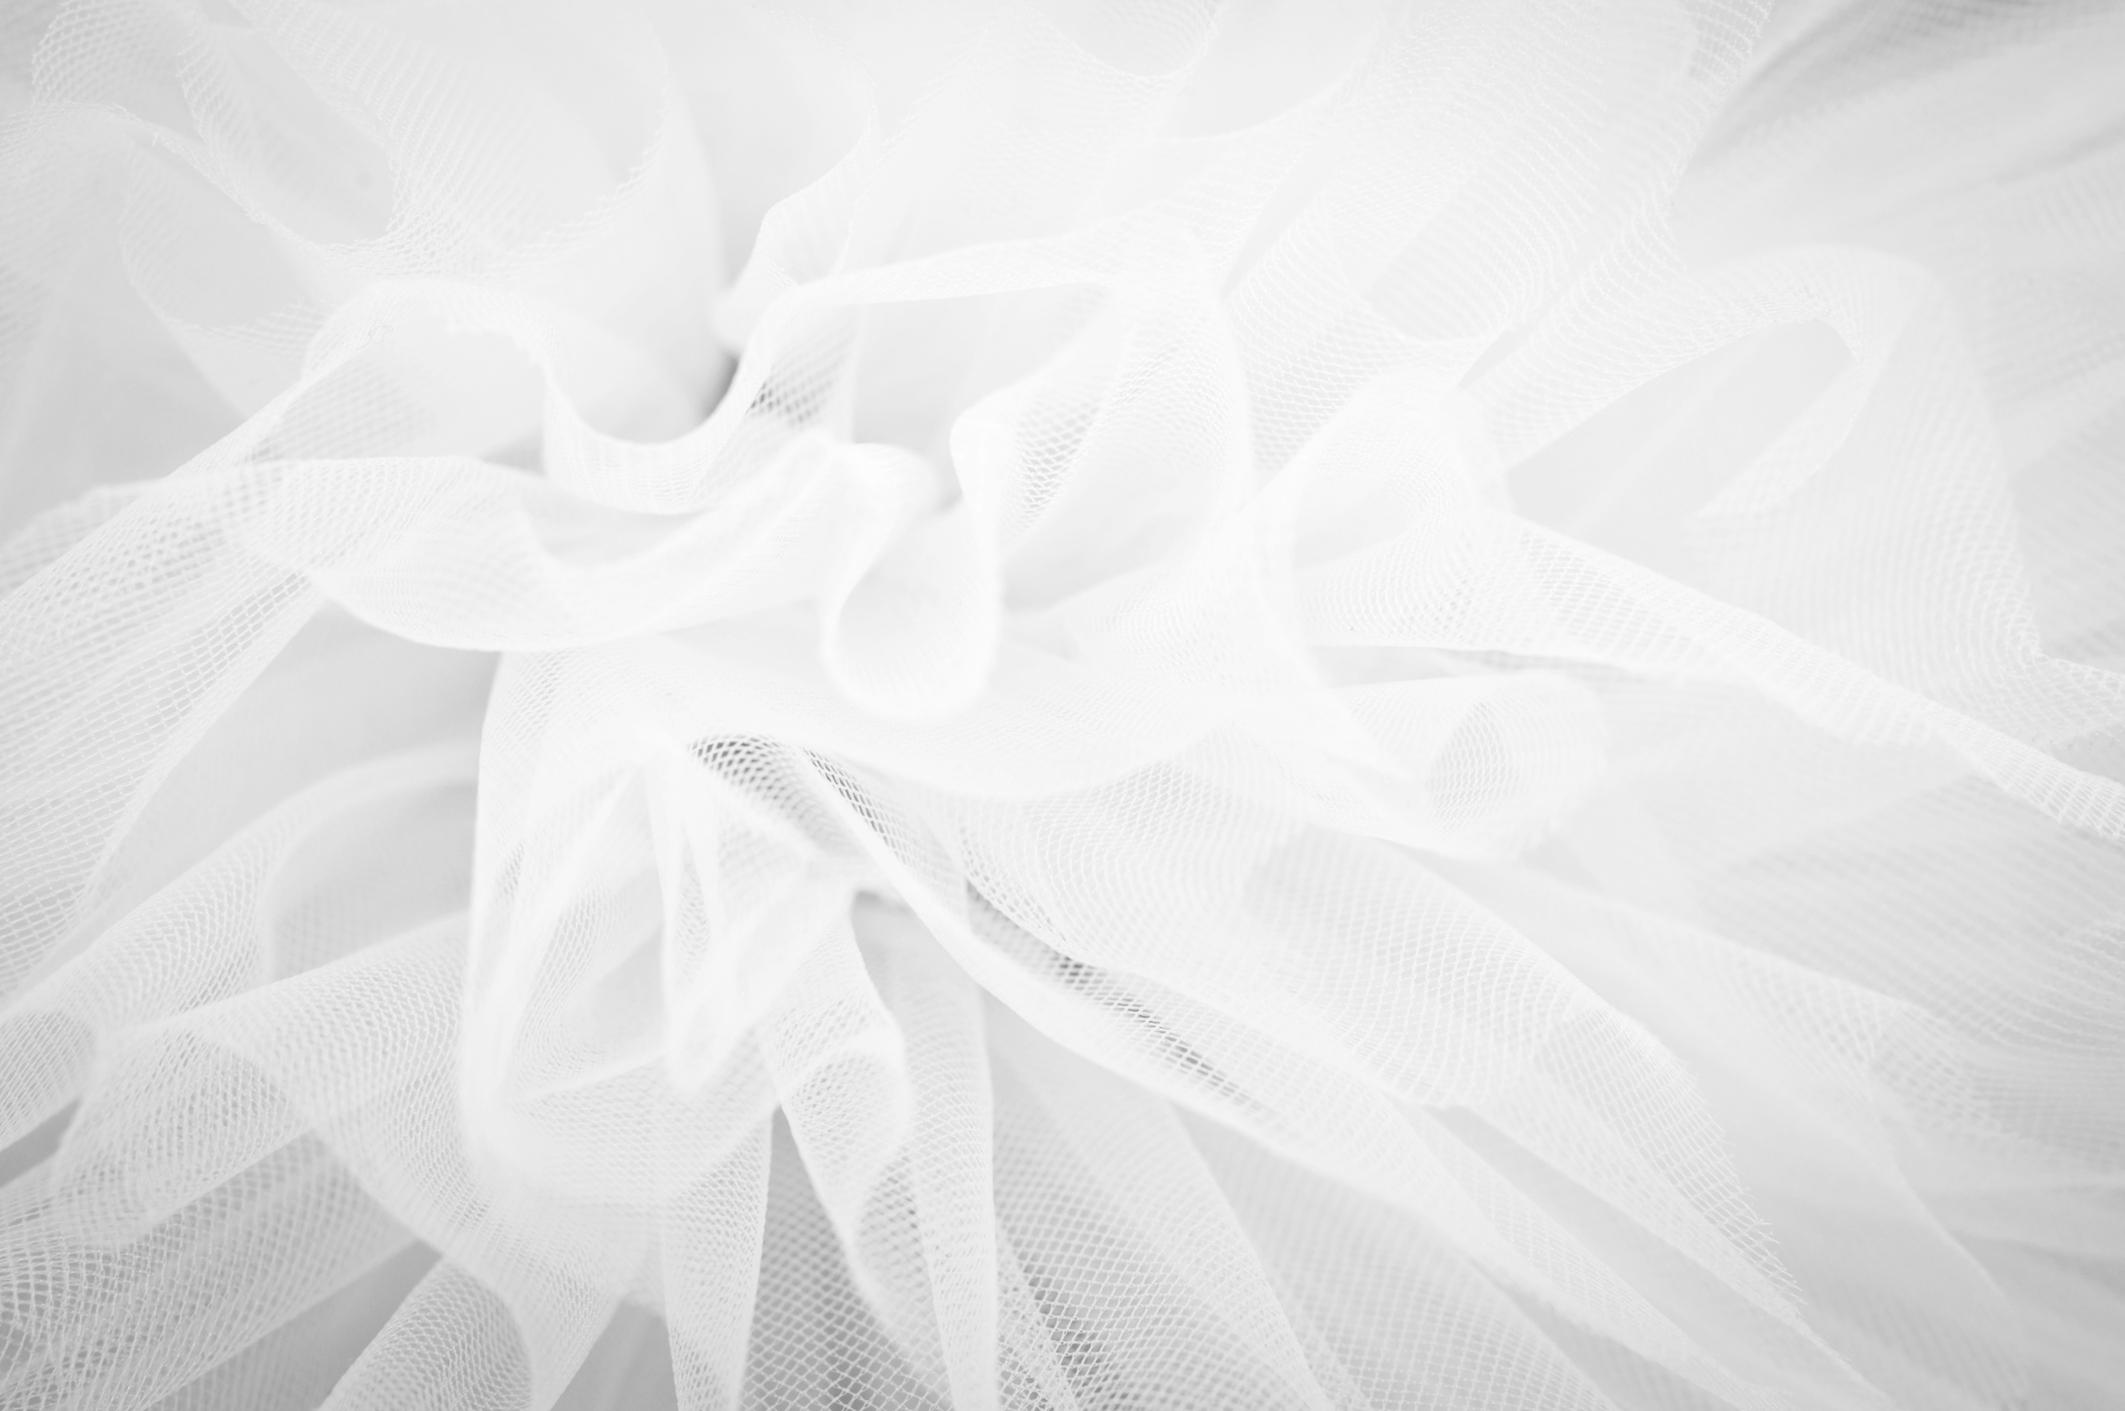 Transparente Eleganz - Tüll, Chiffon, Organza - Sunny Magazin Sunny Dessous